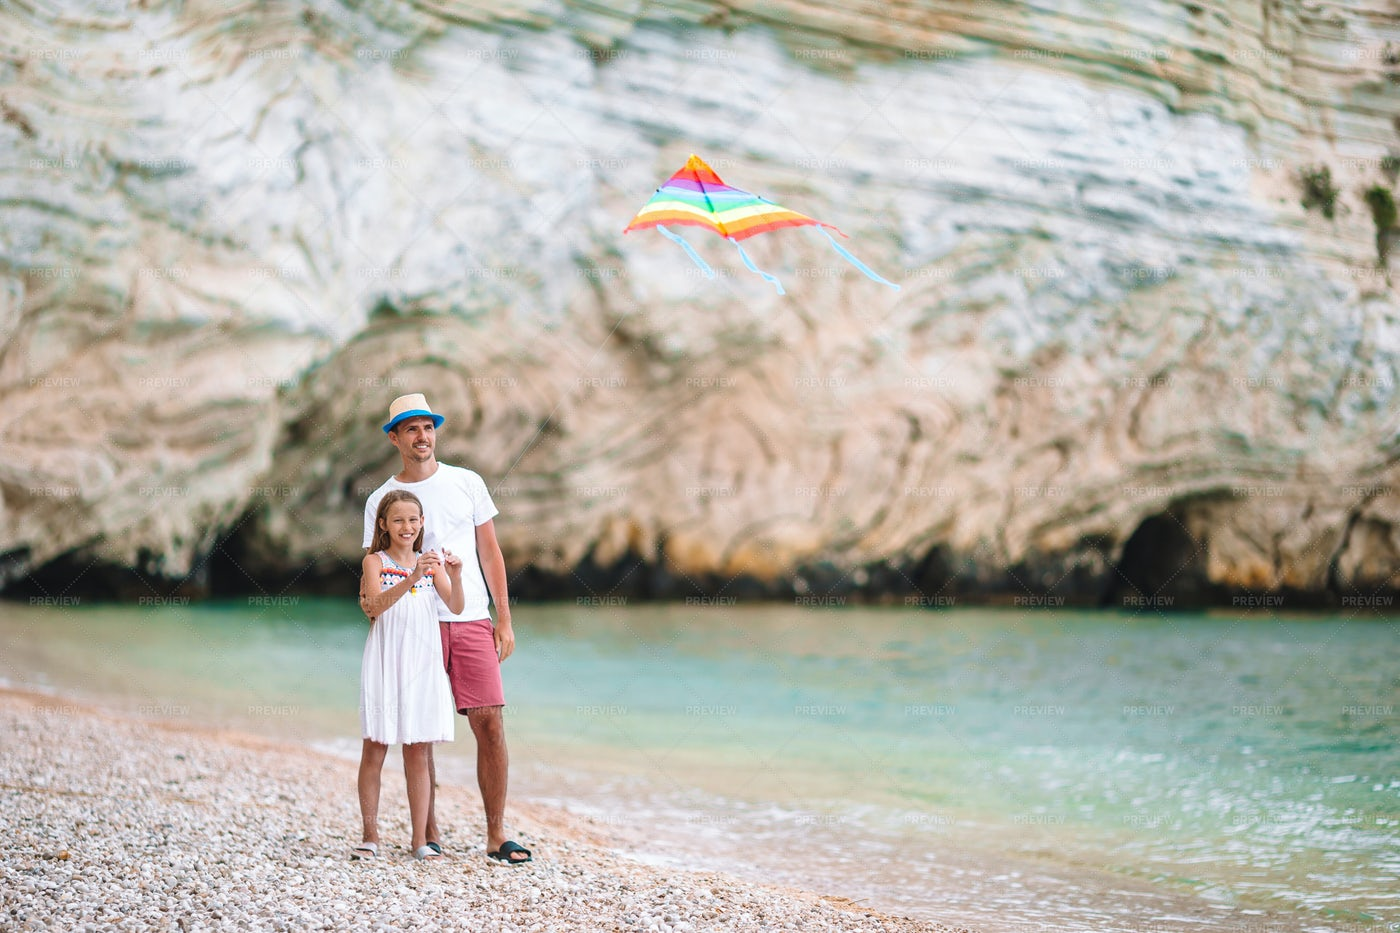 Kite Flying On Vacation: Stock Photos